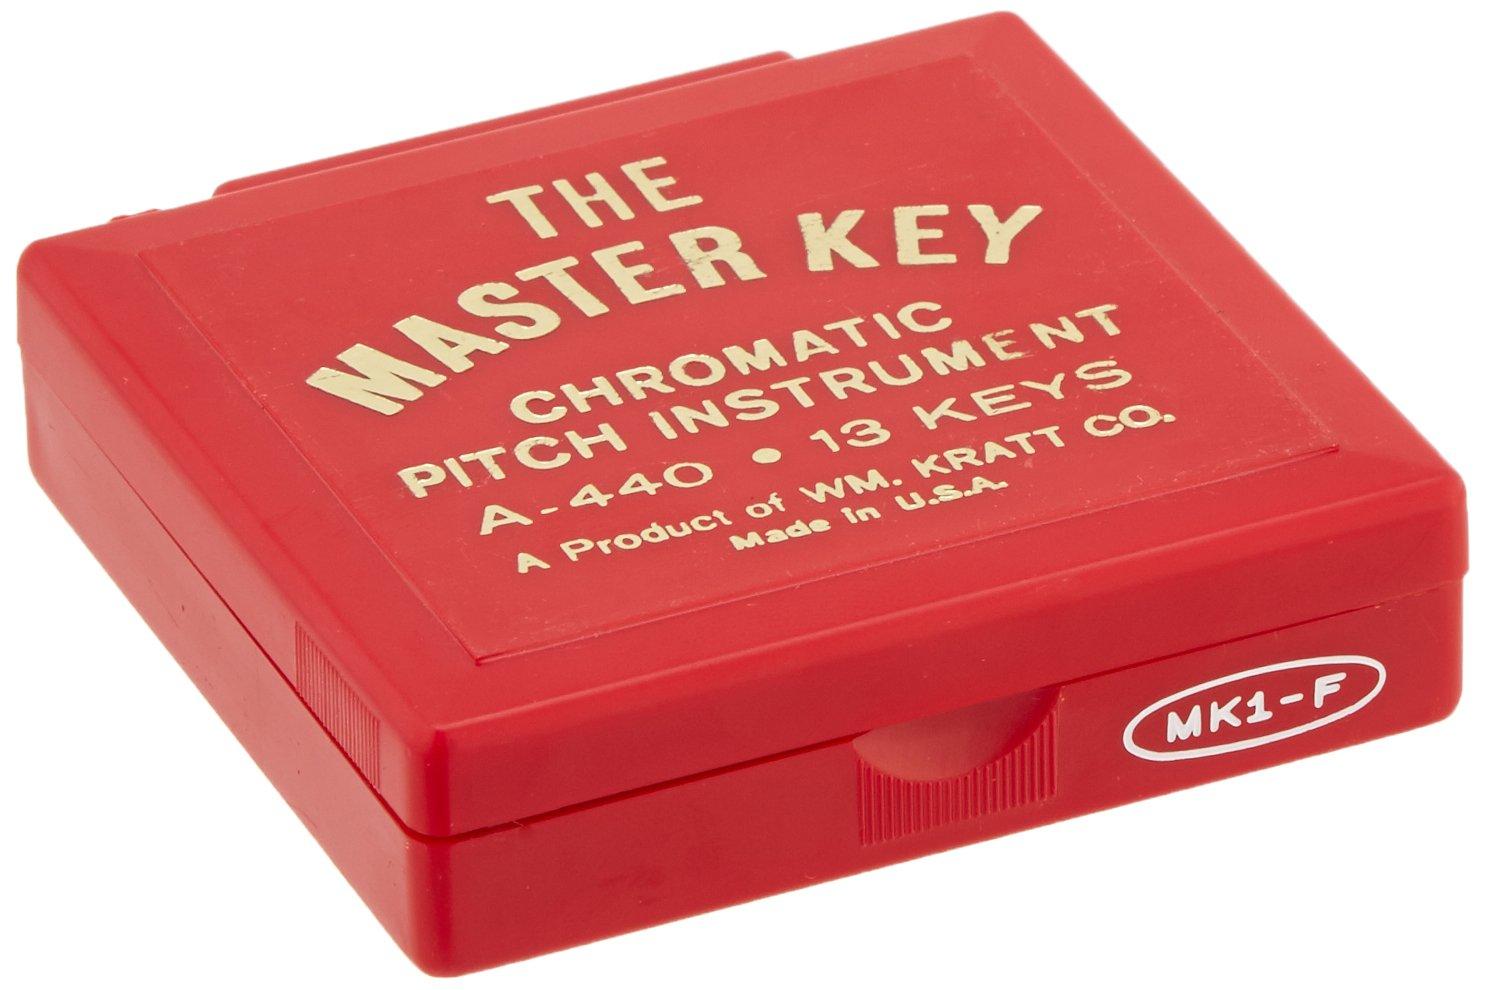 Kratt MK1 Master Key Chromatic Pitch Pipe (F to F) by Kratt (Image #4)